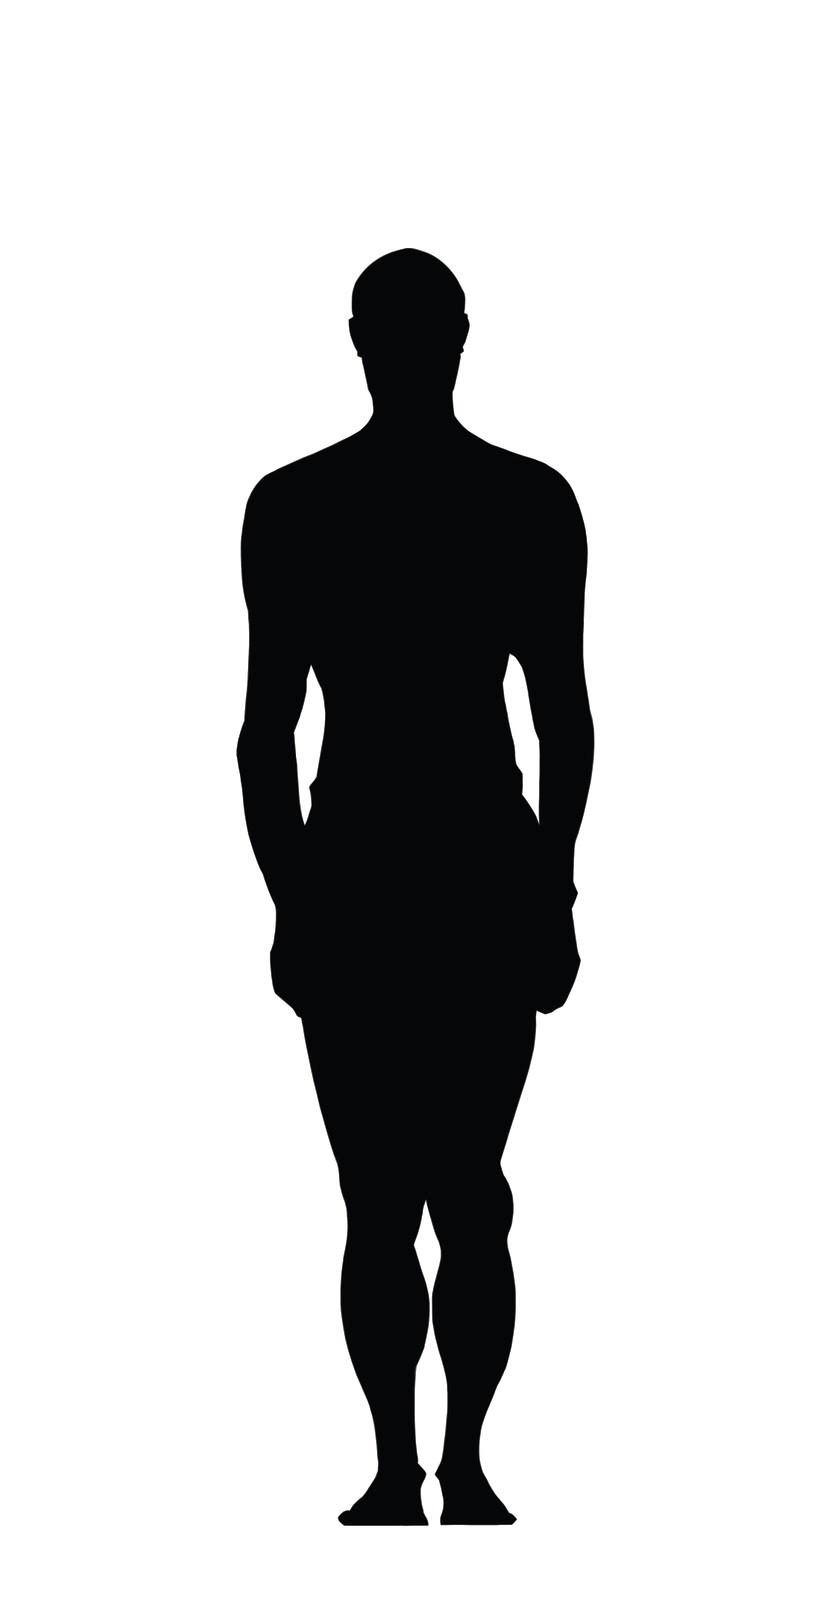 Body silhousette clipart picture transparent stock Body silhouette clipart 3 » Clipart Portal picture transparent stock